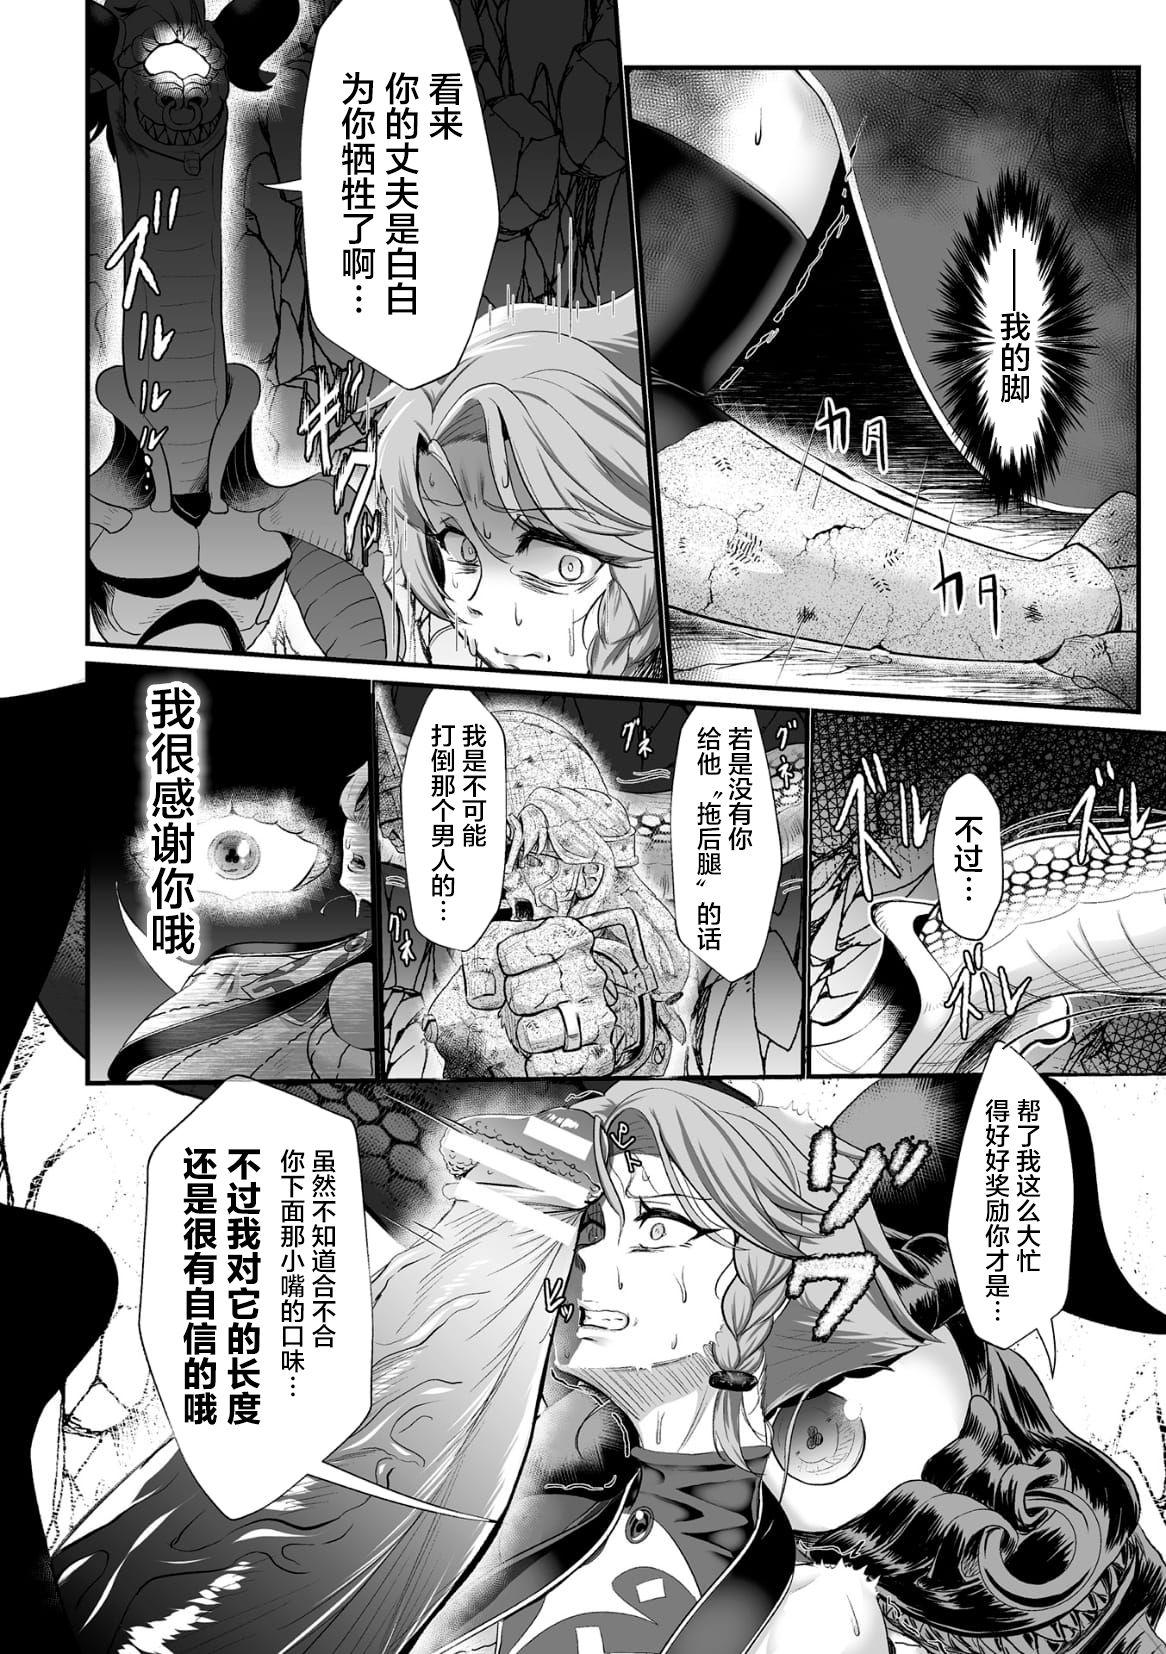 [Mou] Sekkan Fuuin ~Enbi na Sekizou ni Otosareshi Yuusha Ichizoku~ Ch. 1 [Chinese] [不咕鸟汉化组] 5